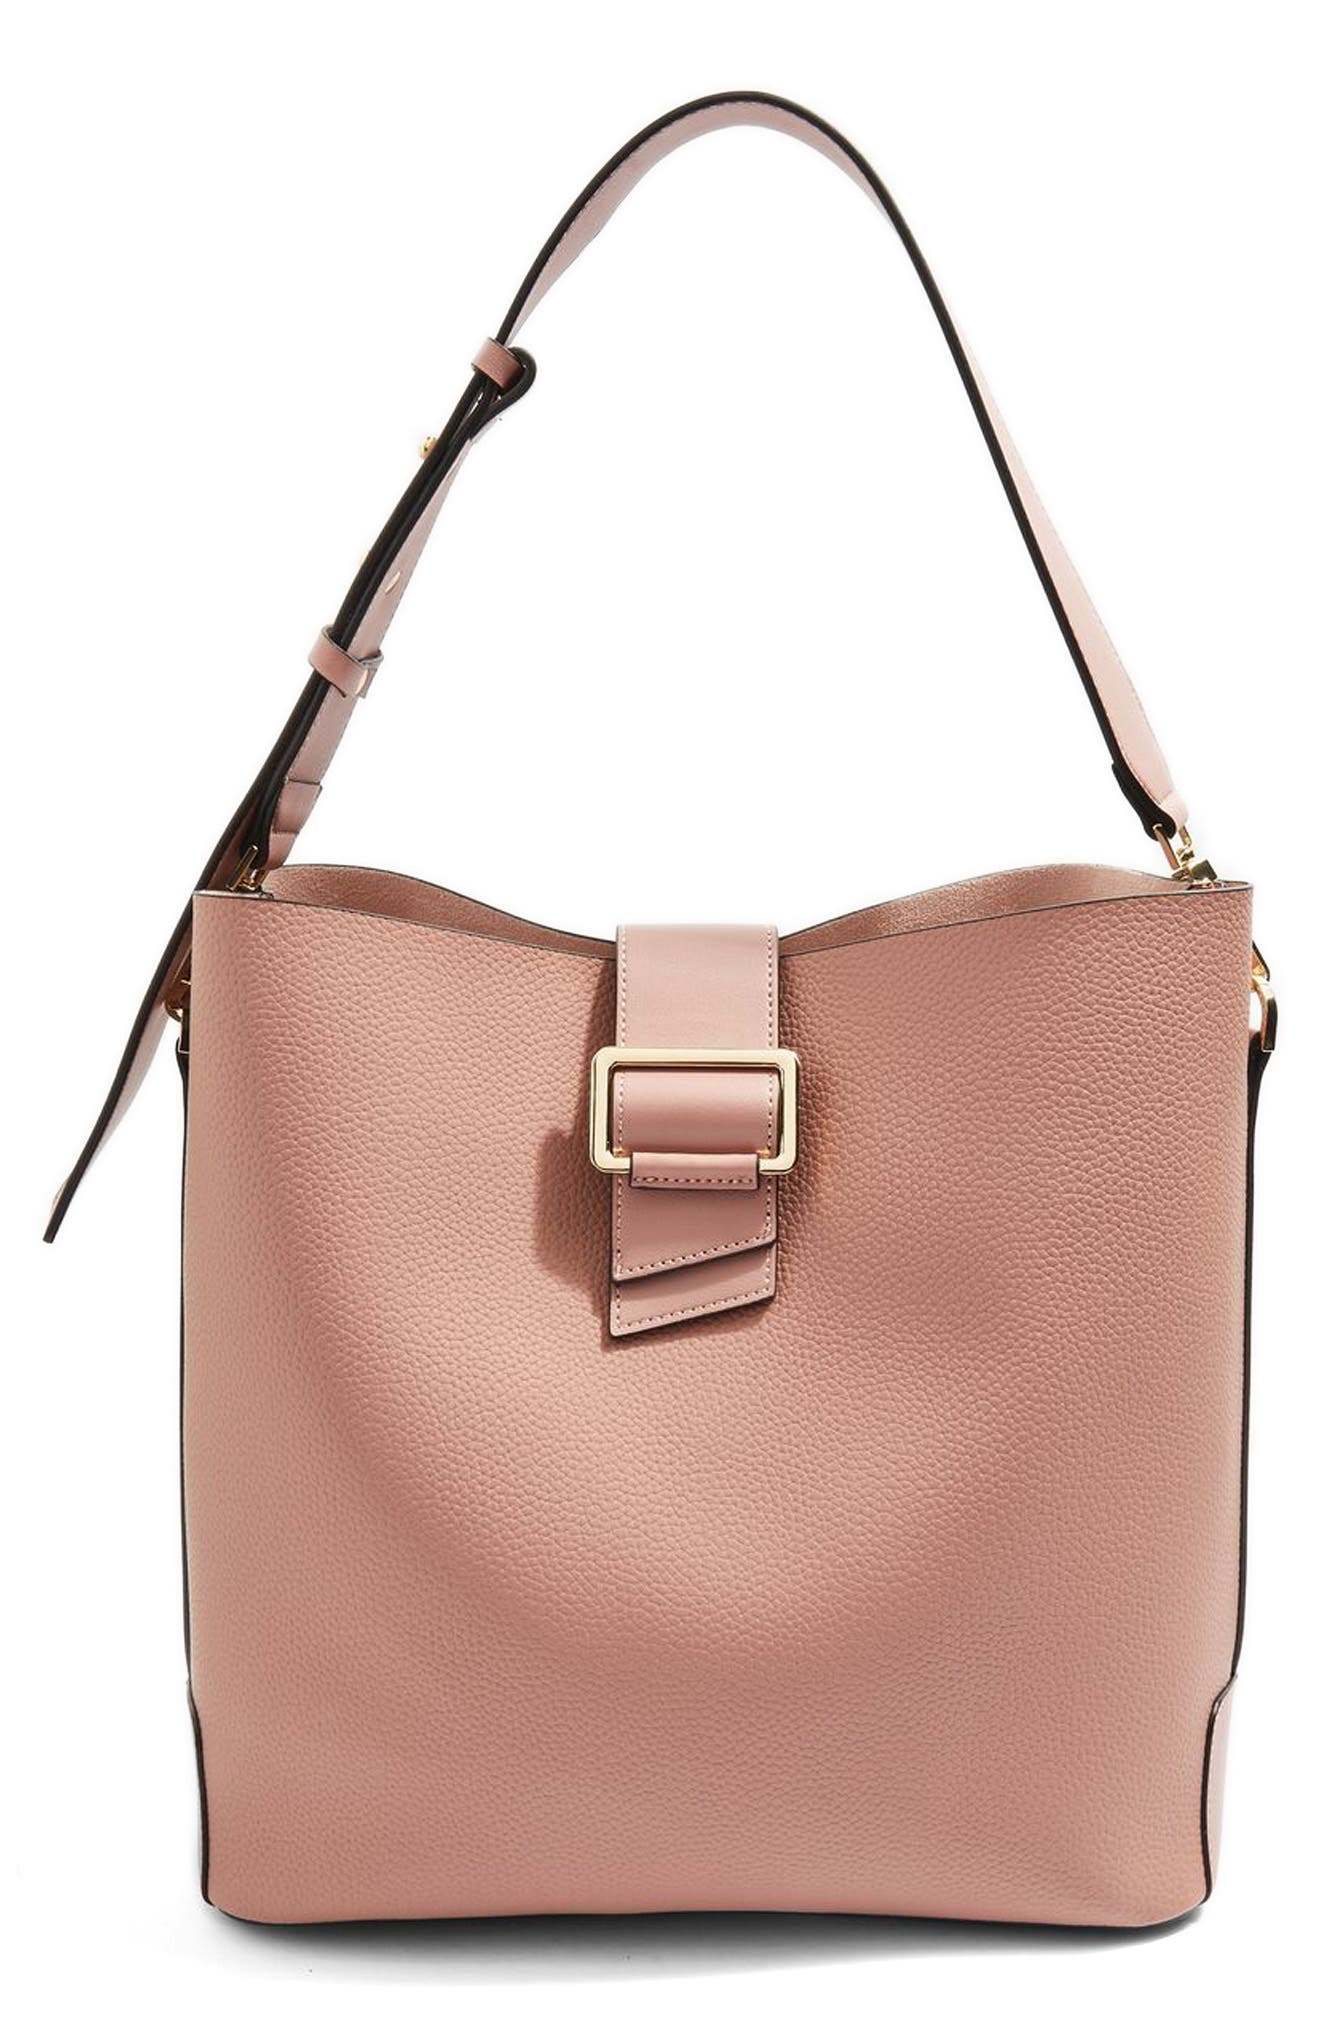 Seema Buckle Hobo Bag,                             Main thumbnail 1, color,                             Pink Multi